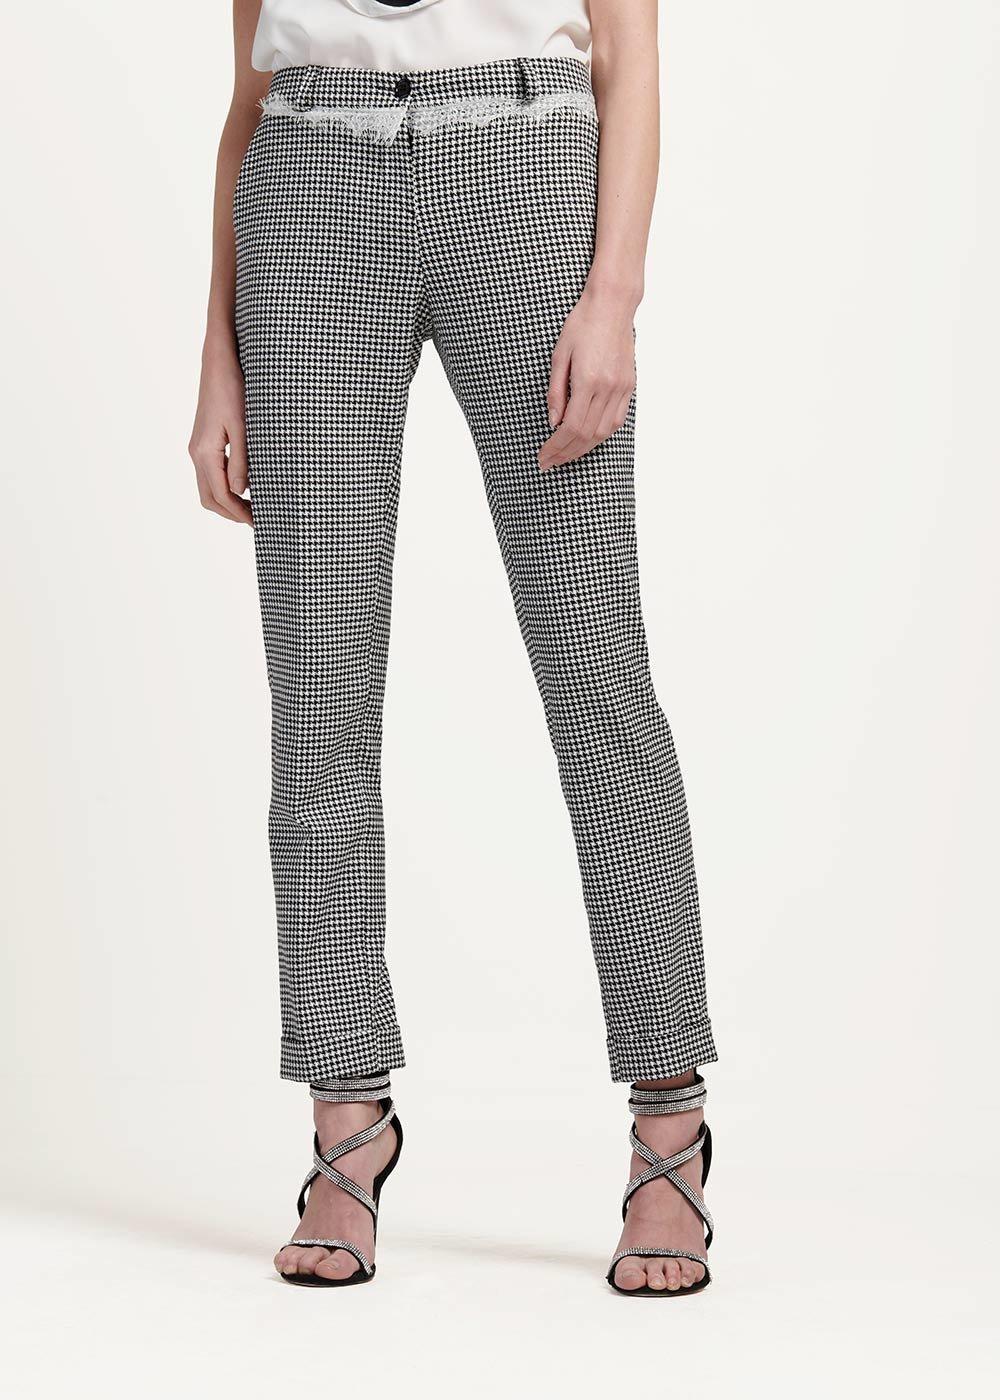 Bella trousers with black&white pattern - White Black Fantasia - Woman